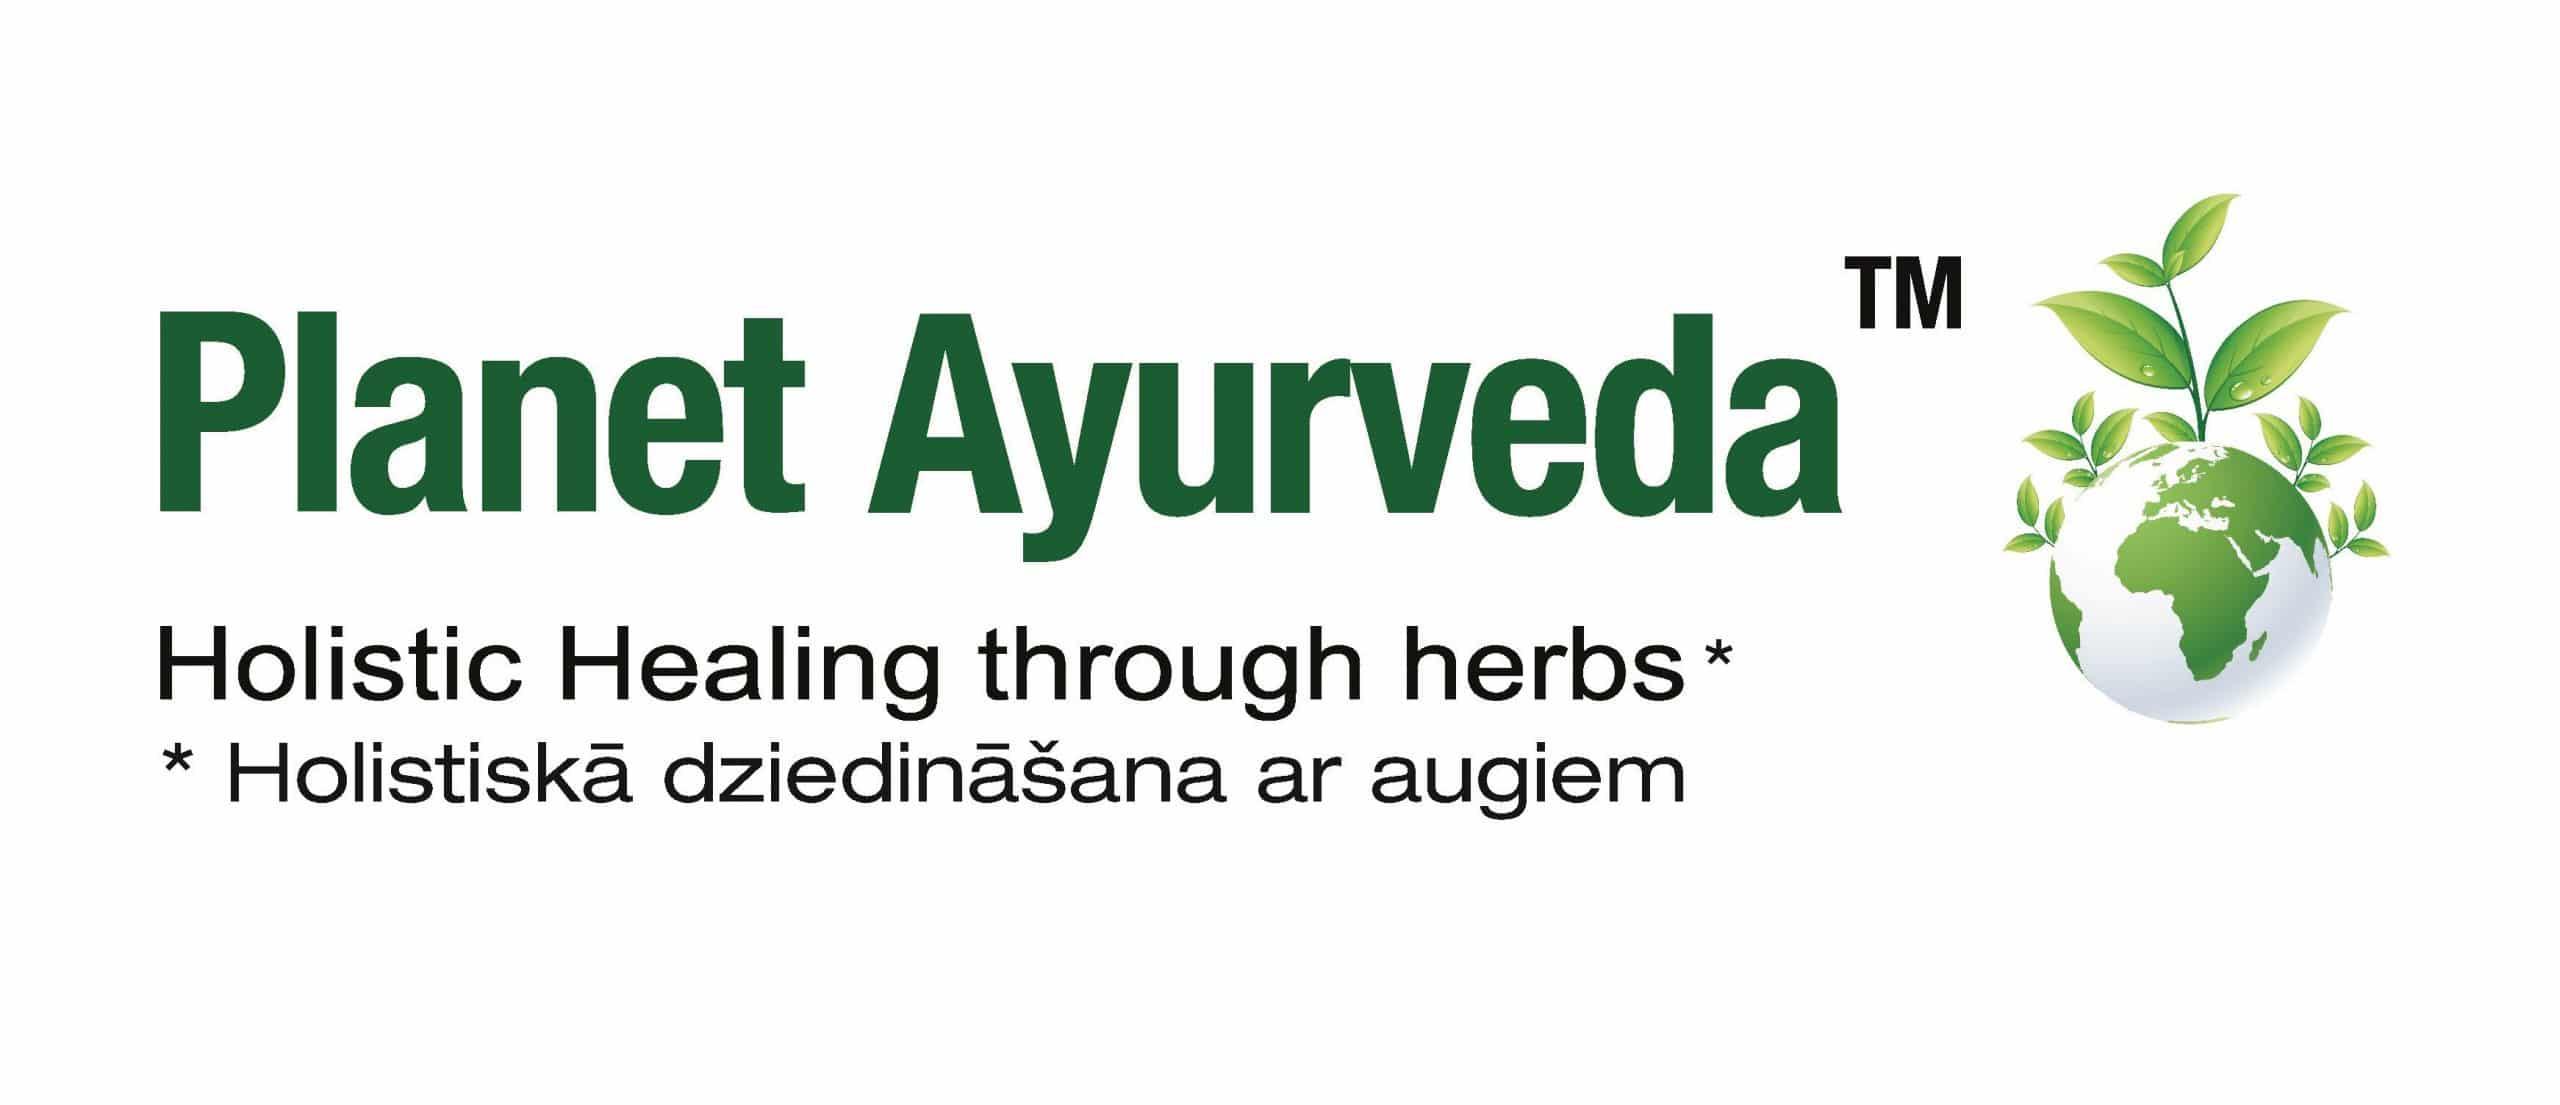 Planet Ayurveda™